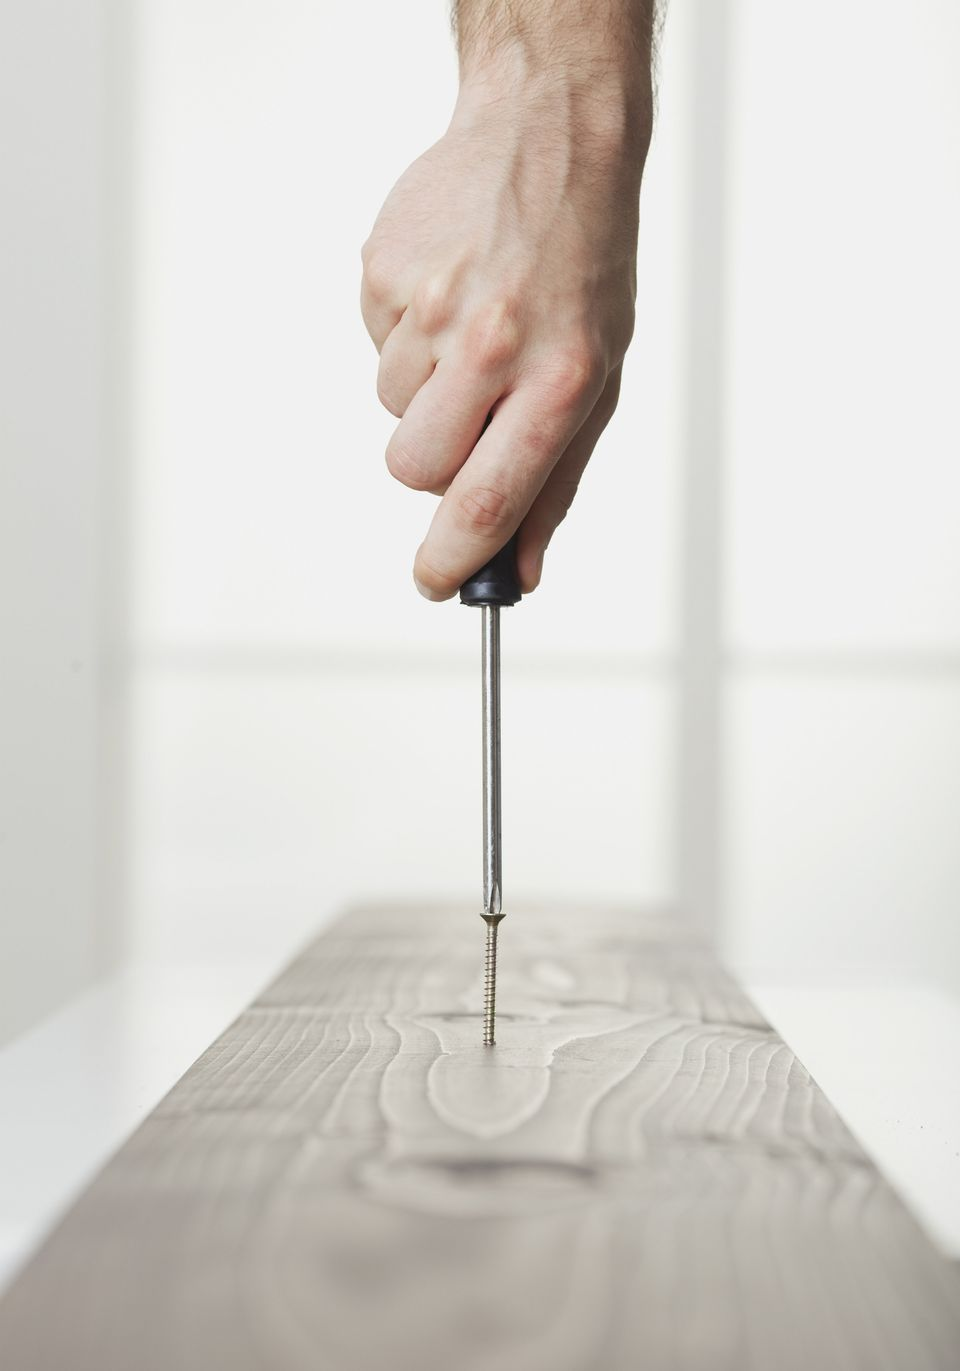 Removing Screw